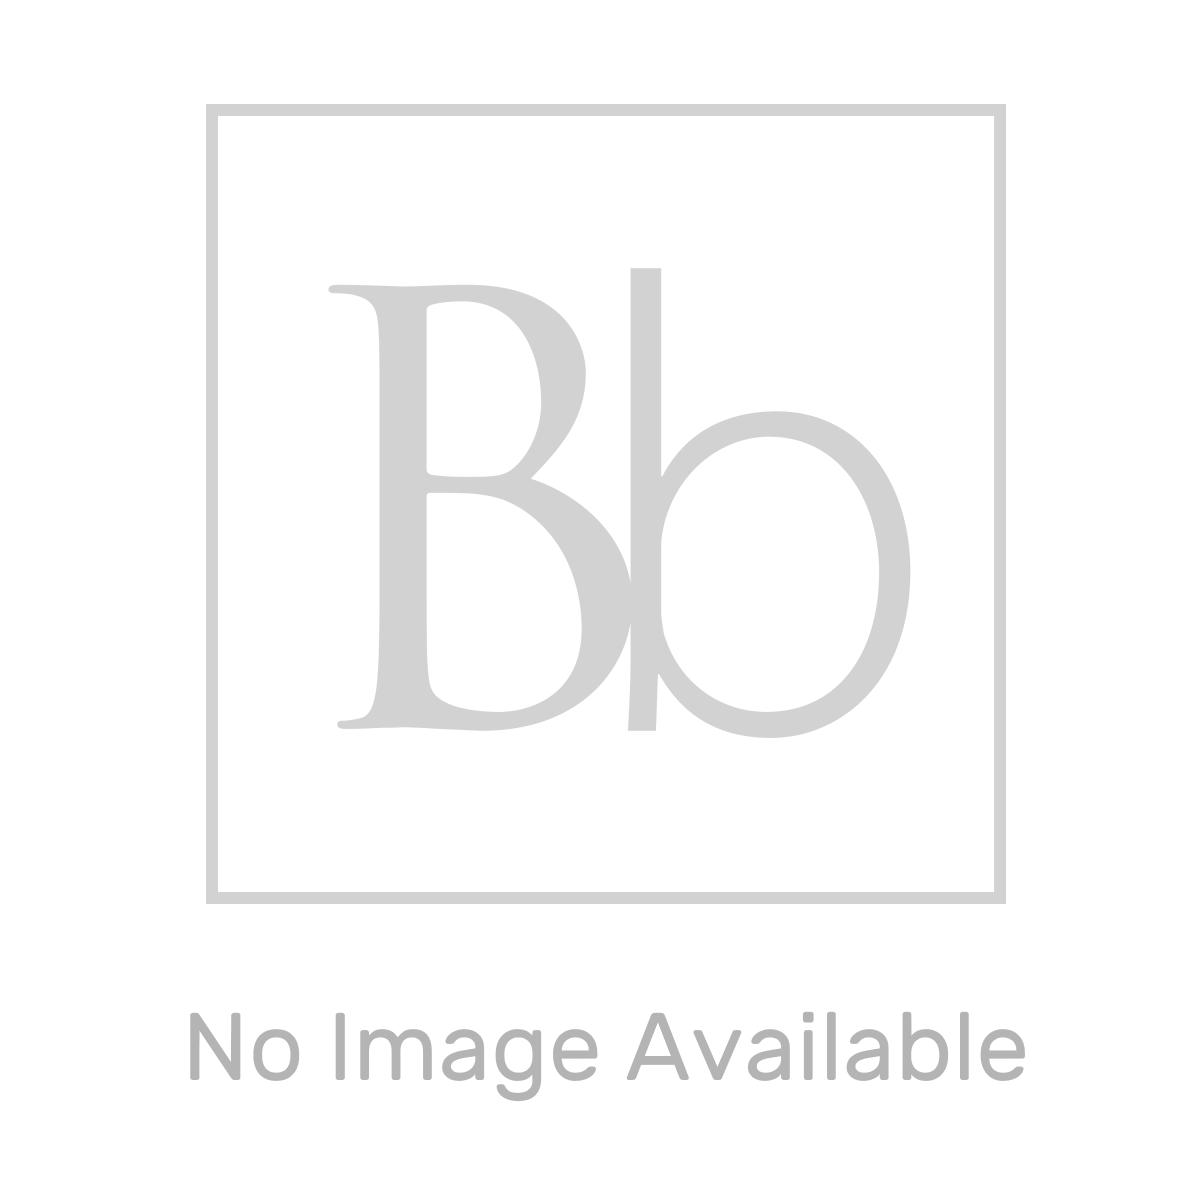 Premier Barmby Single Ended Bath 1800 x 800mm Dimensions